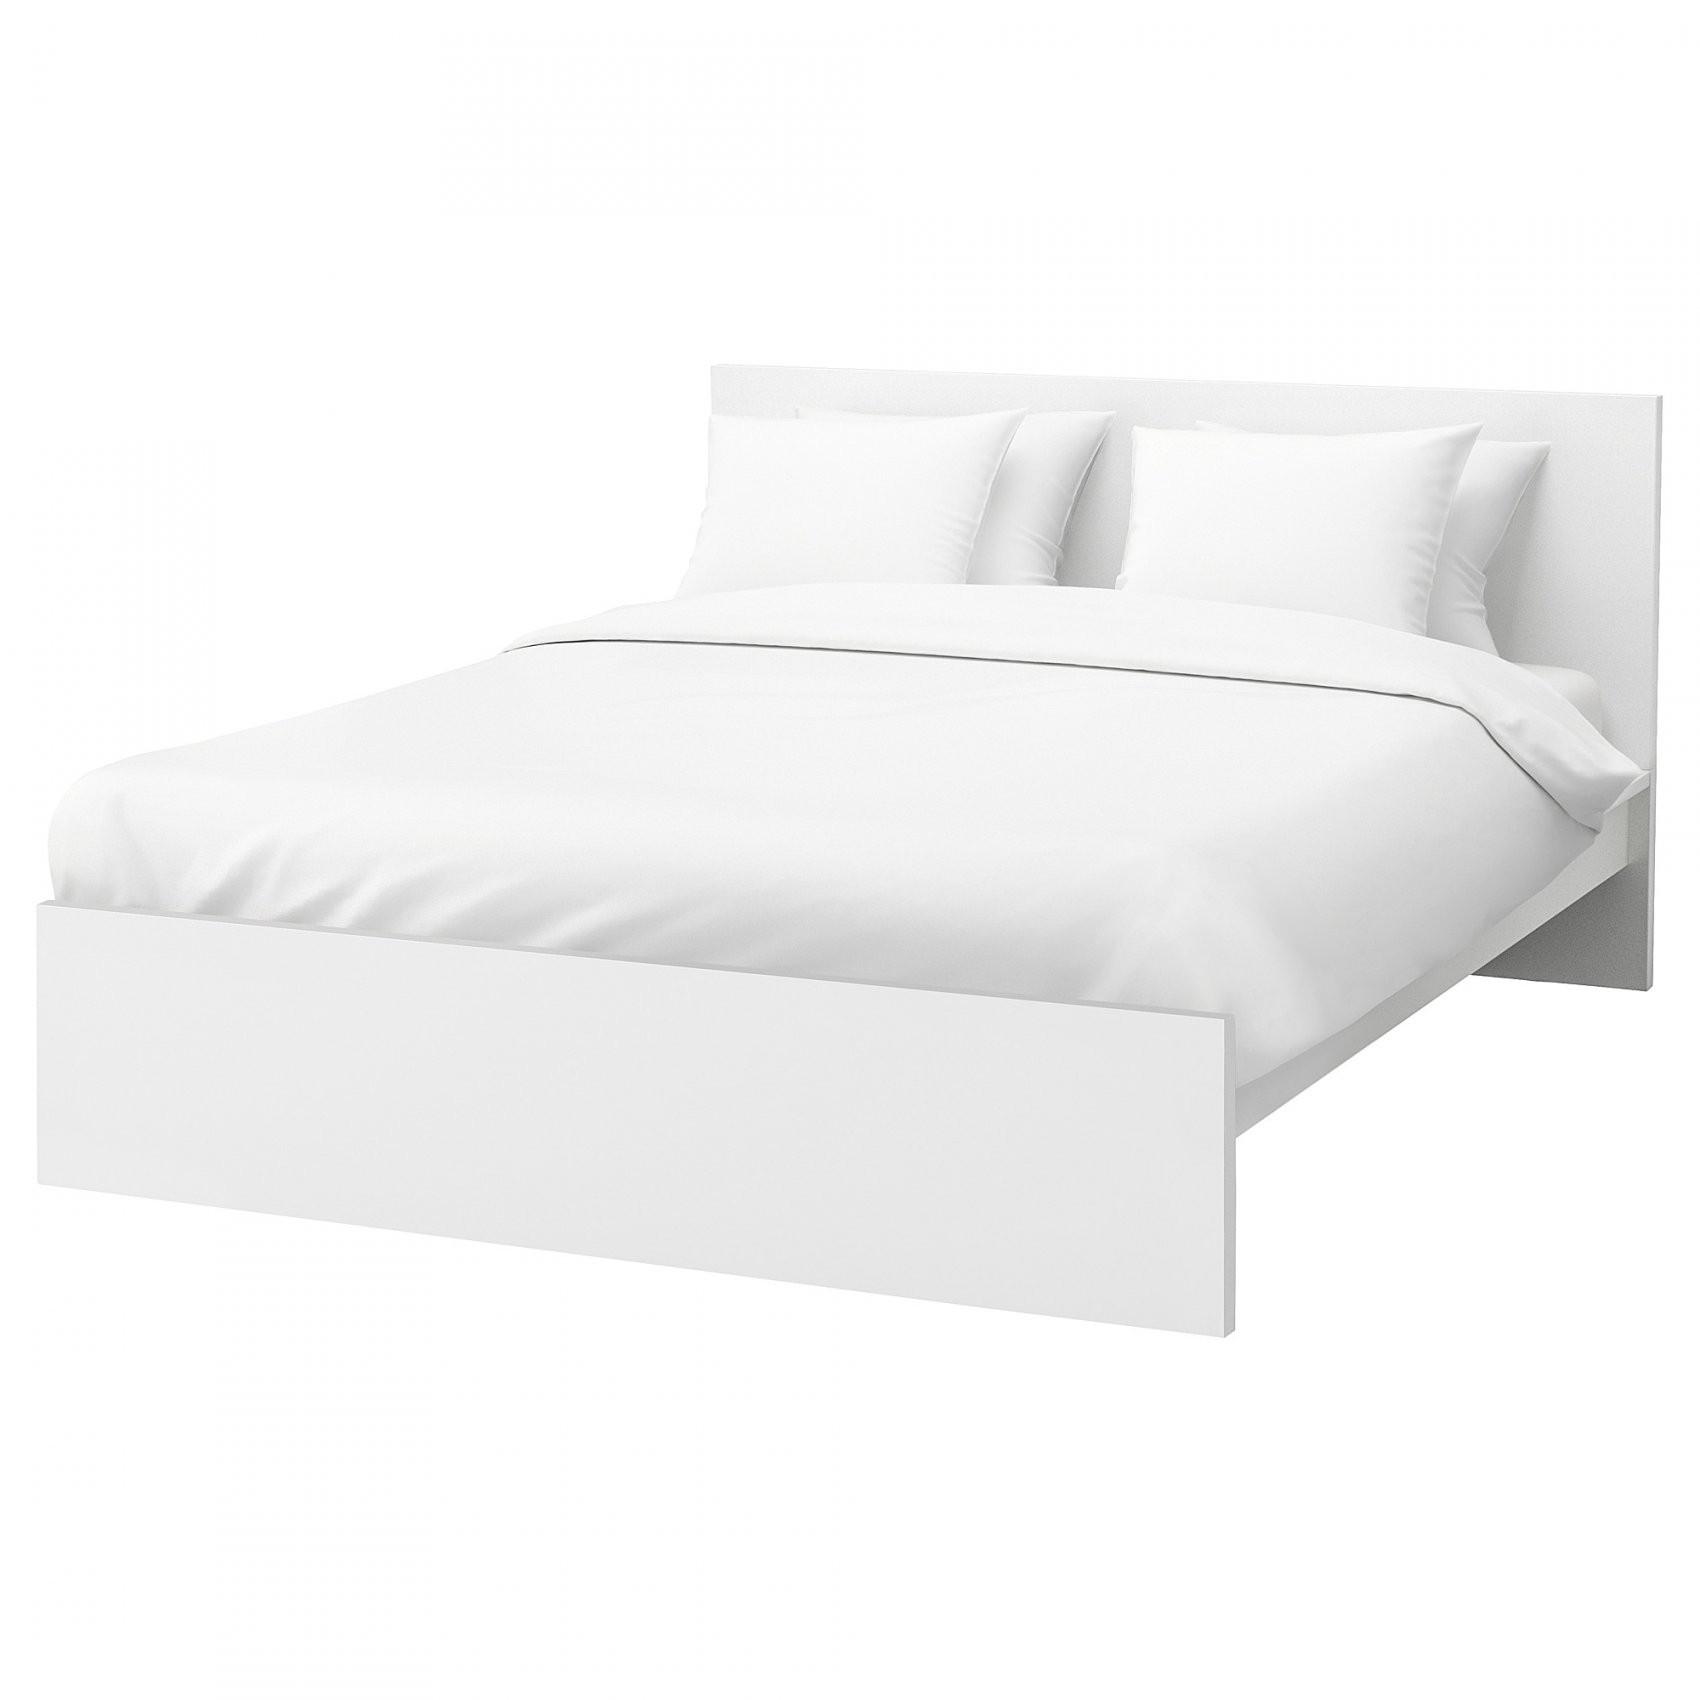 Malm Bettgestell Hoch  Weiß  Ikea von Ikea Malm Bett 140X200 Weiß Bild